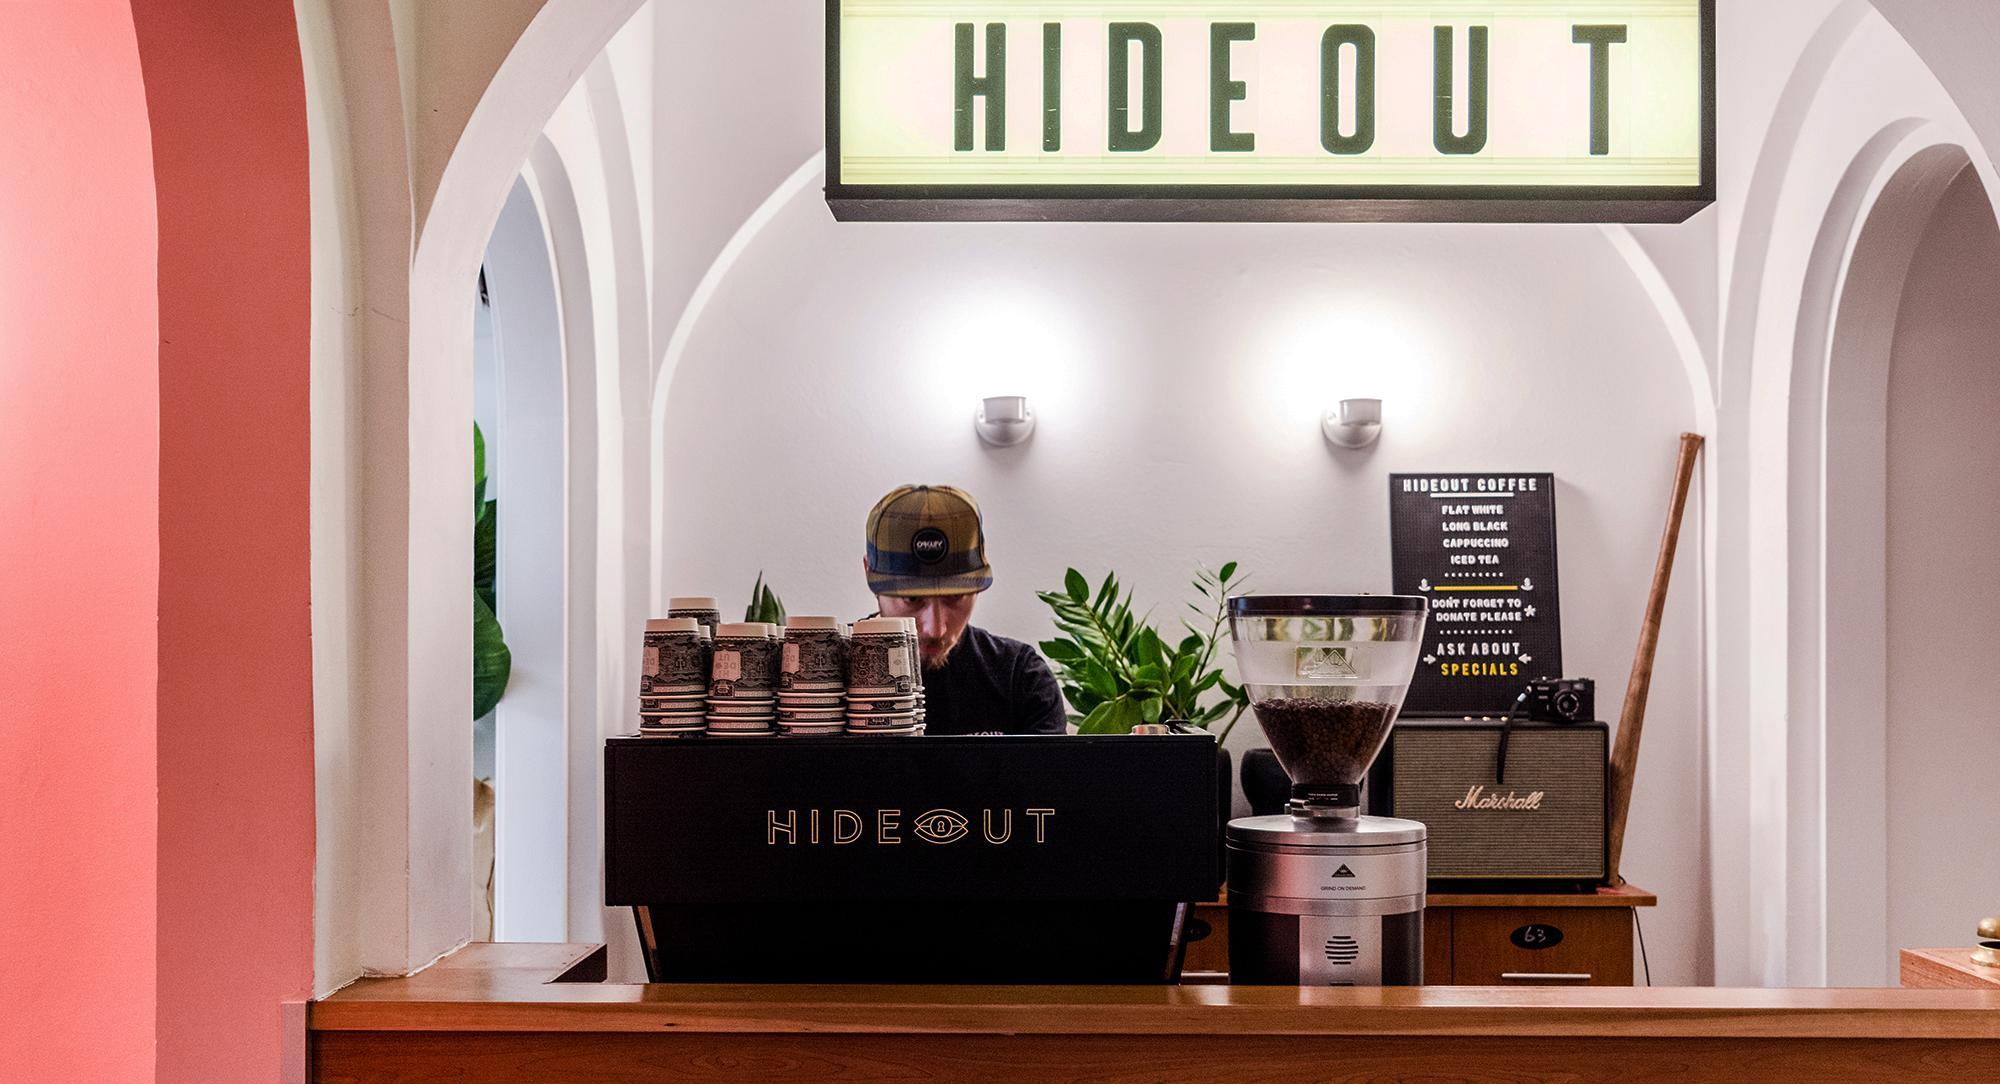 Hideout coffe – 4Marketing